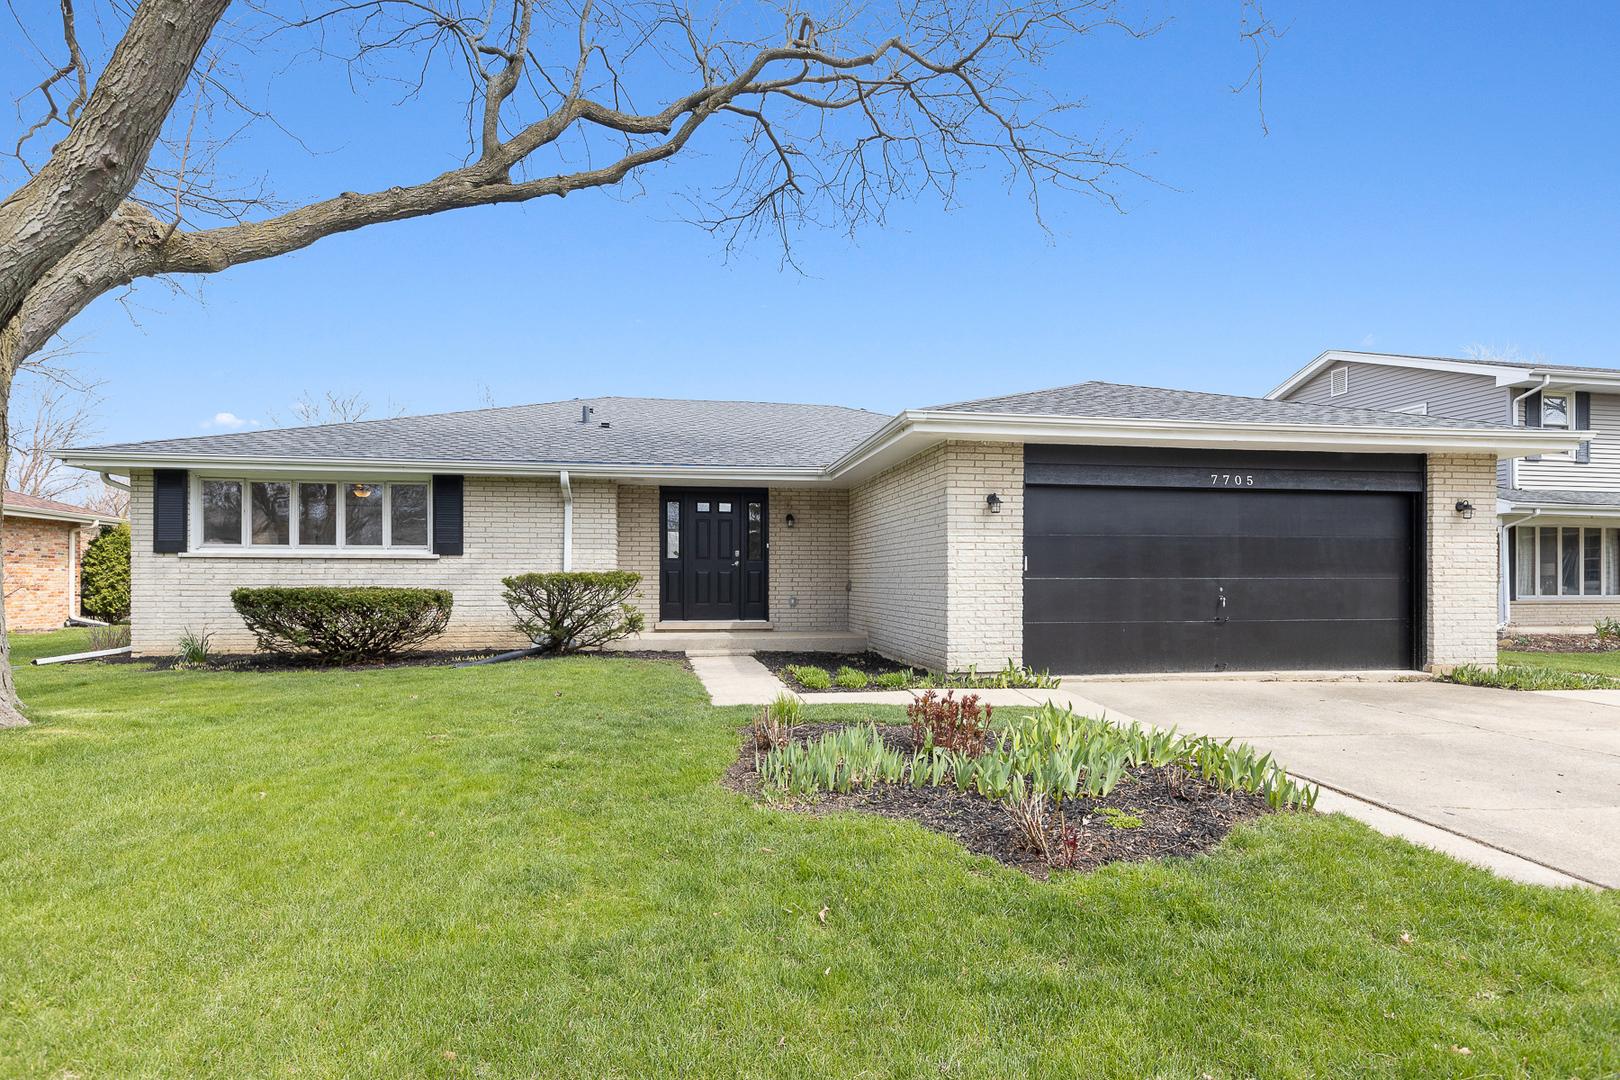 7705 Rohrer Drive, Downers Grove, Illinois